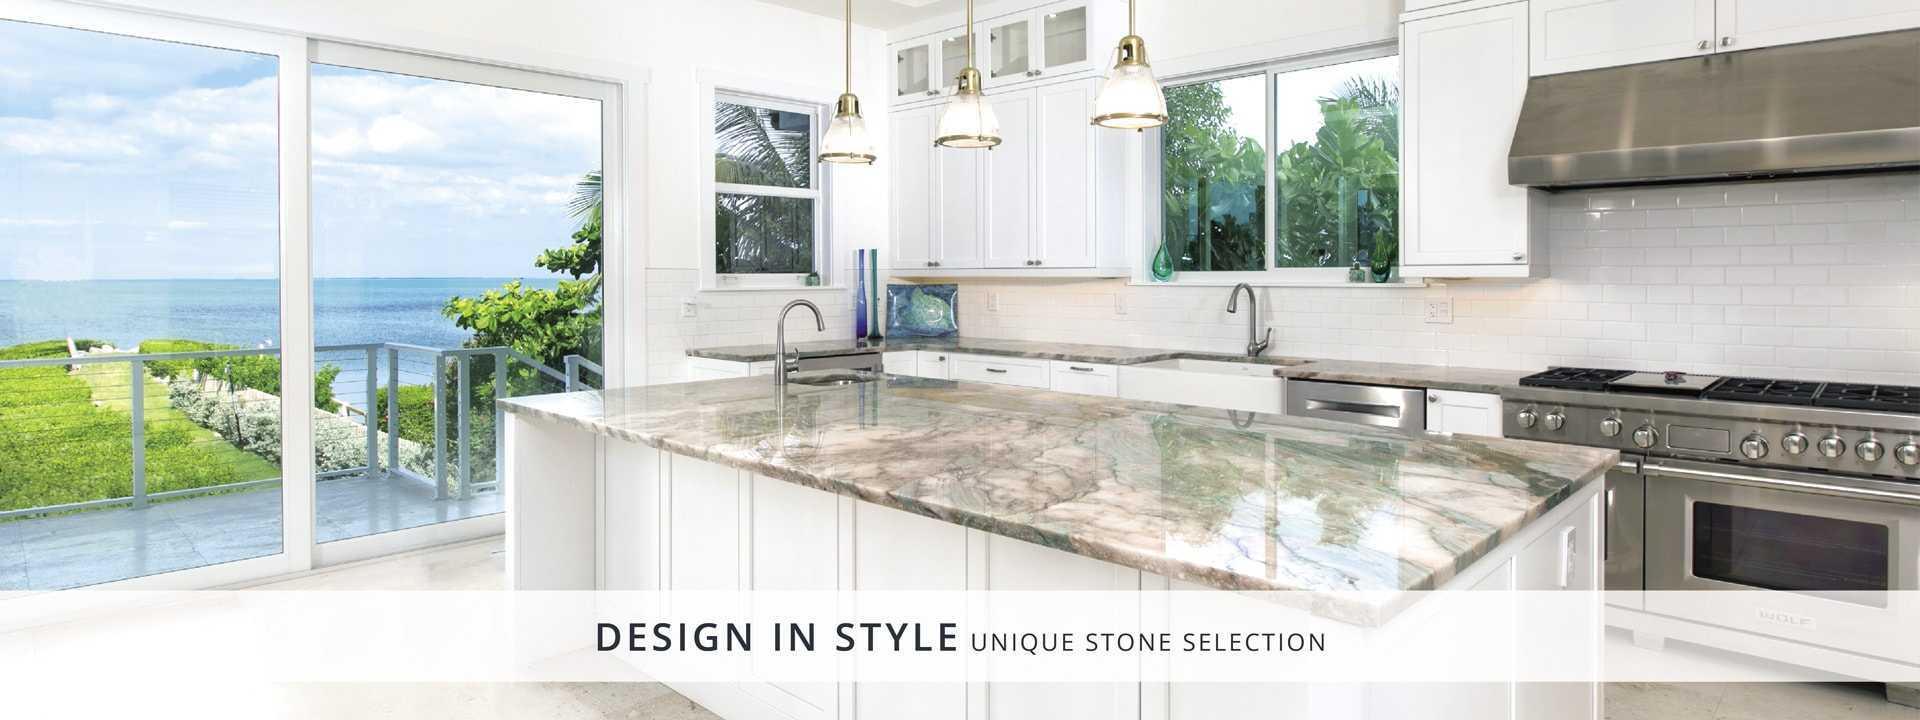 Carousel Banners 1600x6003 Jade Desktop 1, Primestones® Granite, Quartz, Marble